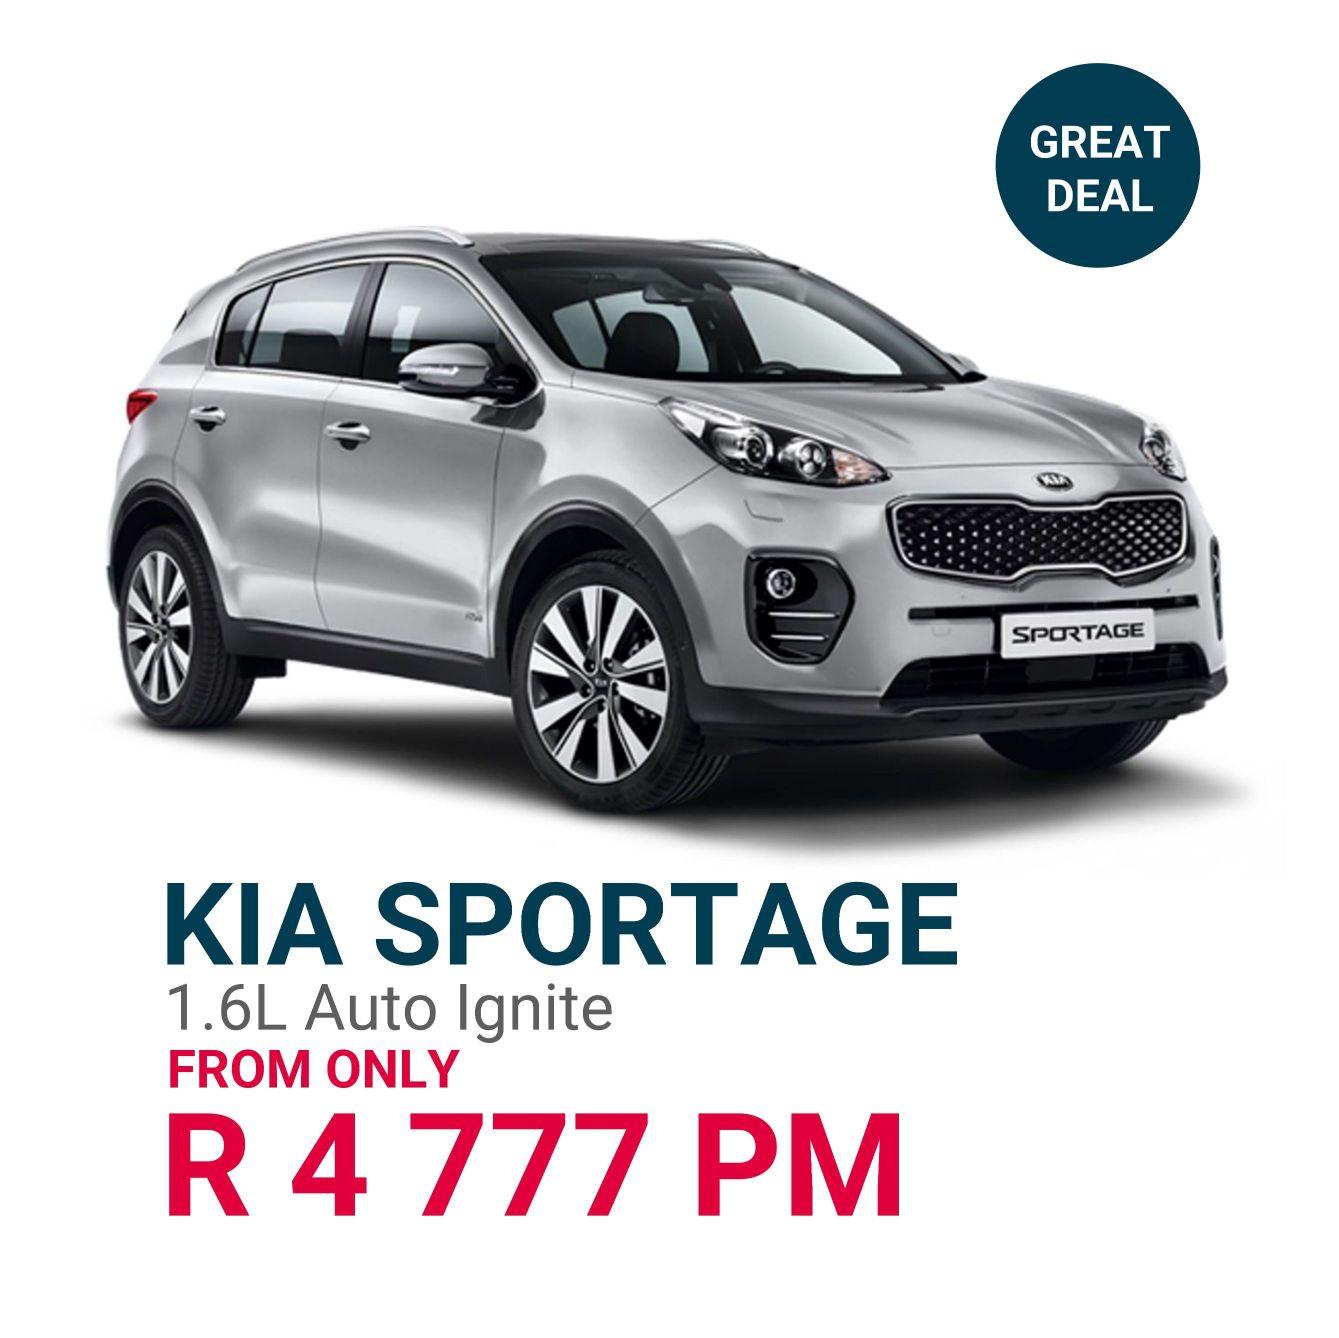 kia-sportage-1-6-auto-ignite-from-only-r4-777pm